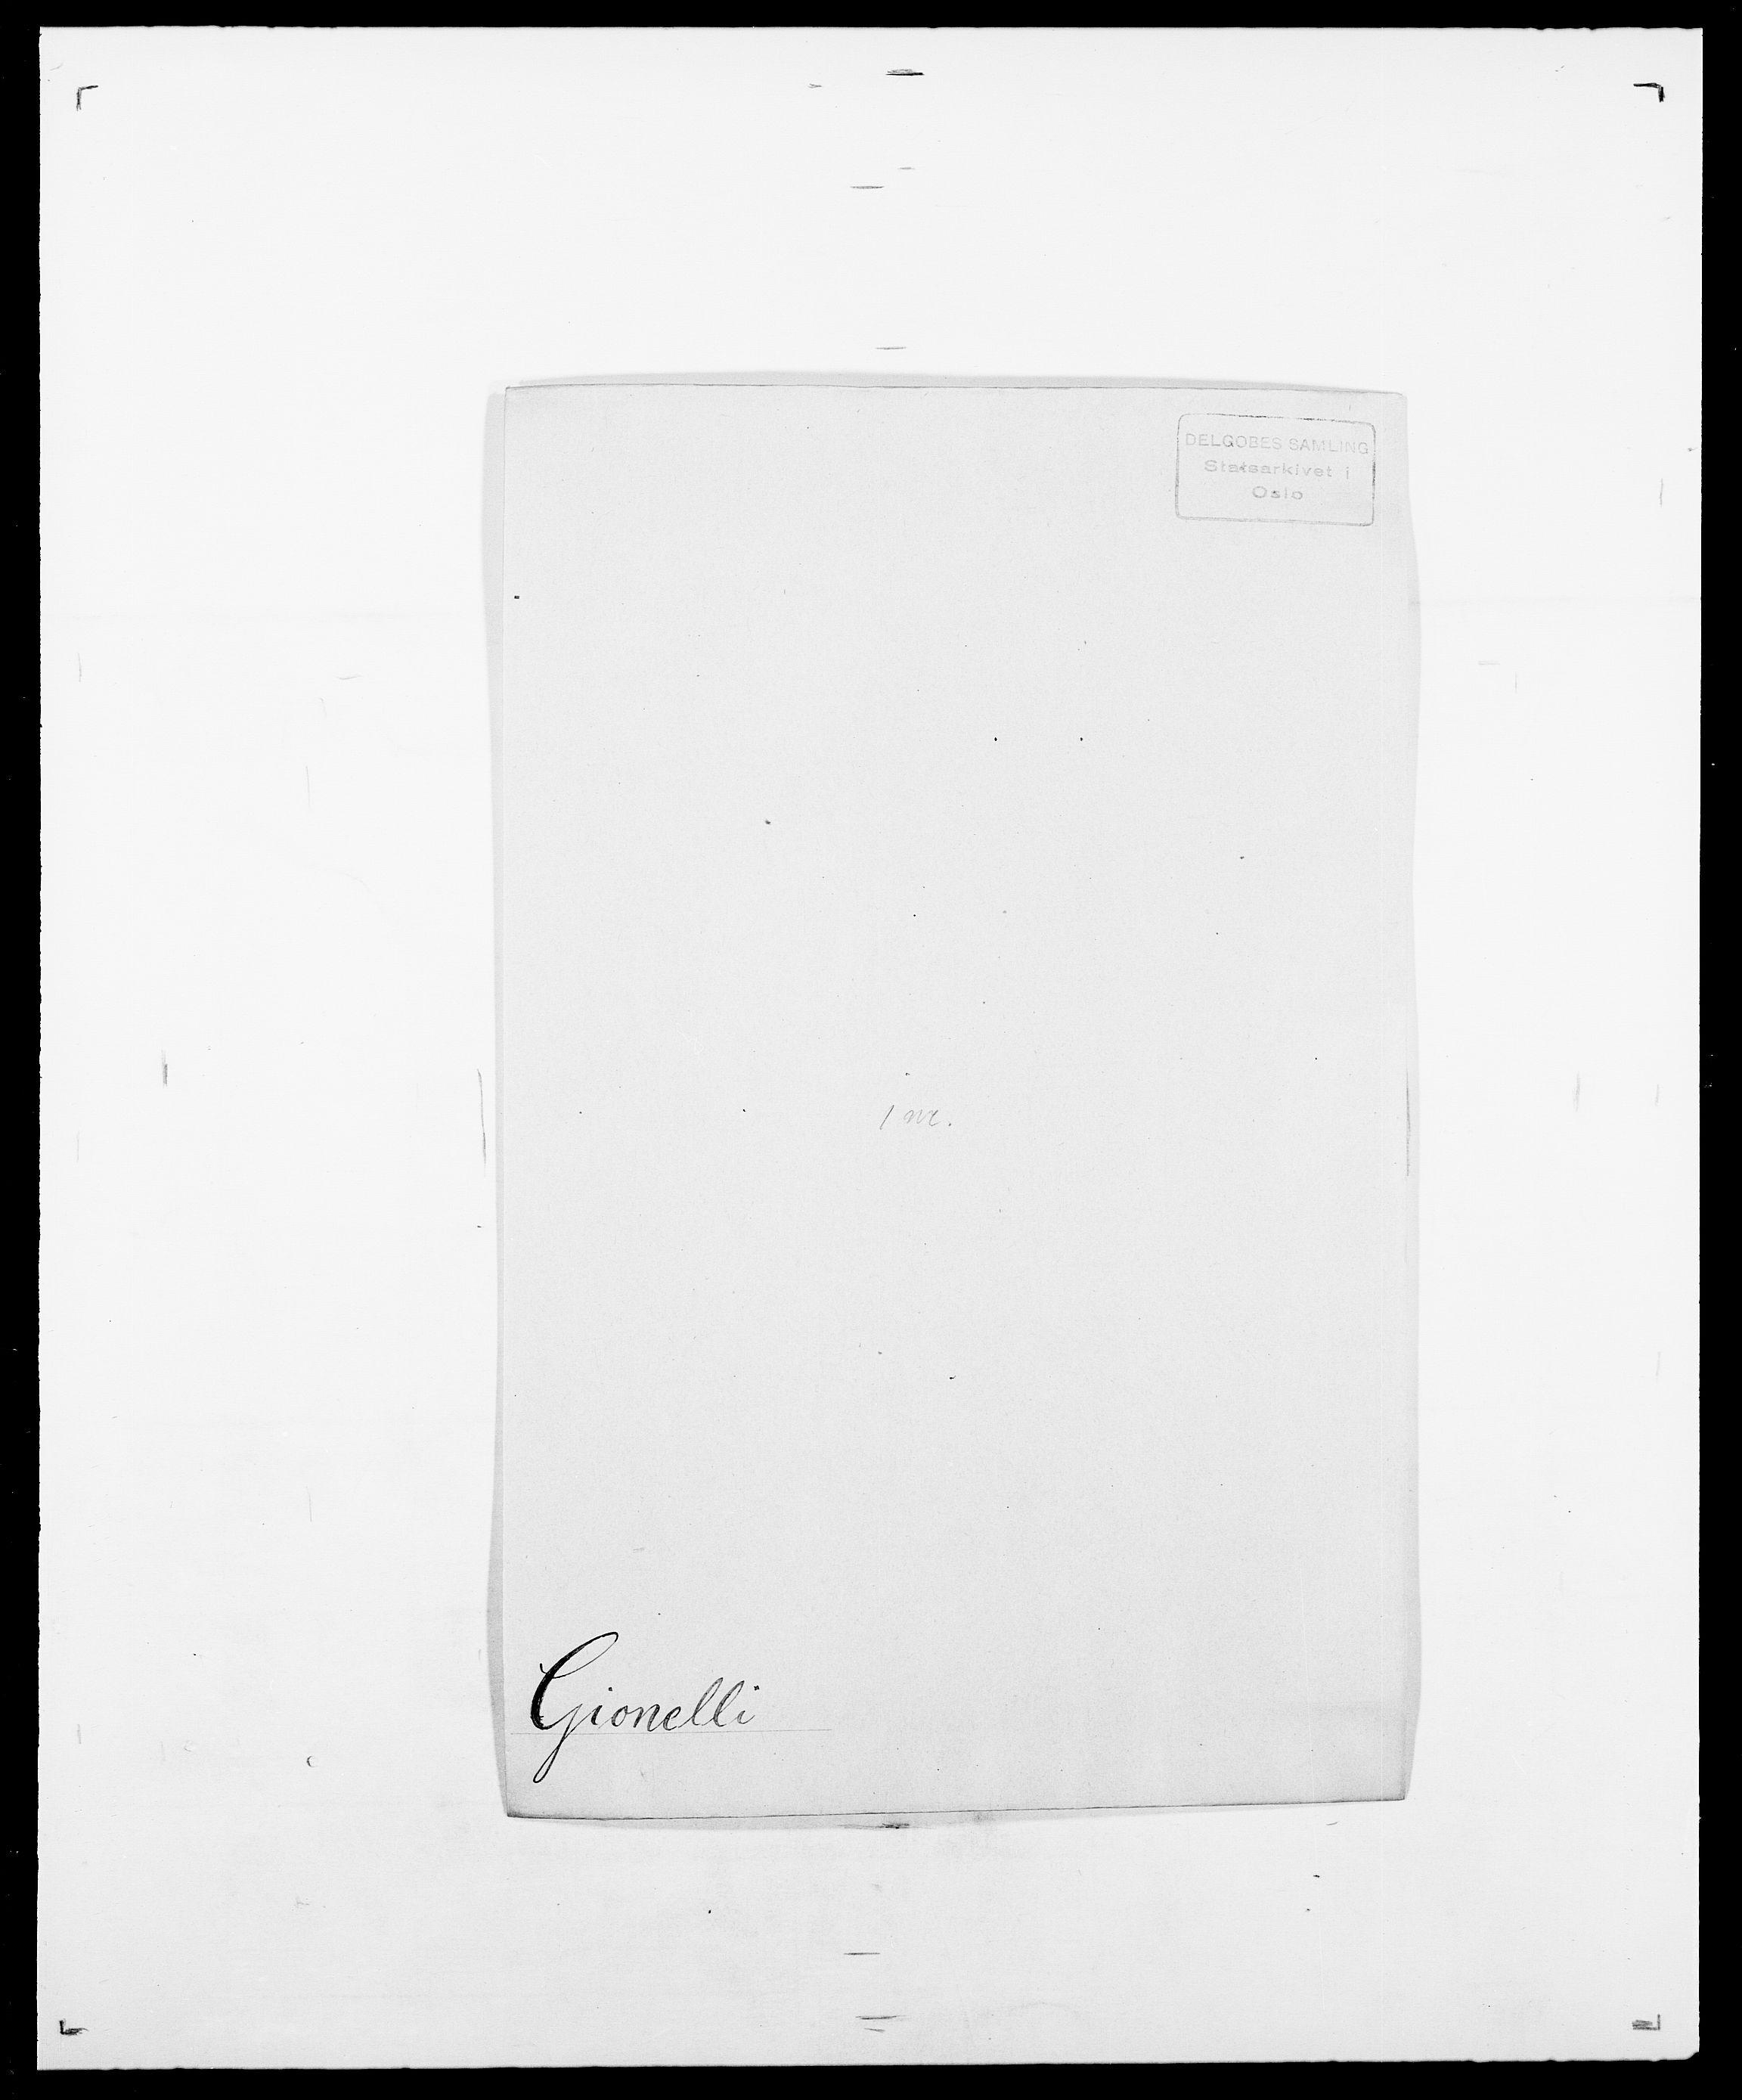 SAO, Delgobe, Charles Antoine - samling, D/Da/L0014: Giebdhausen - Grip, s. 42